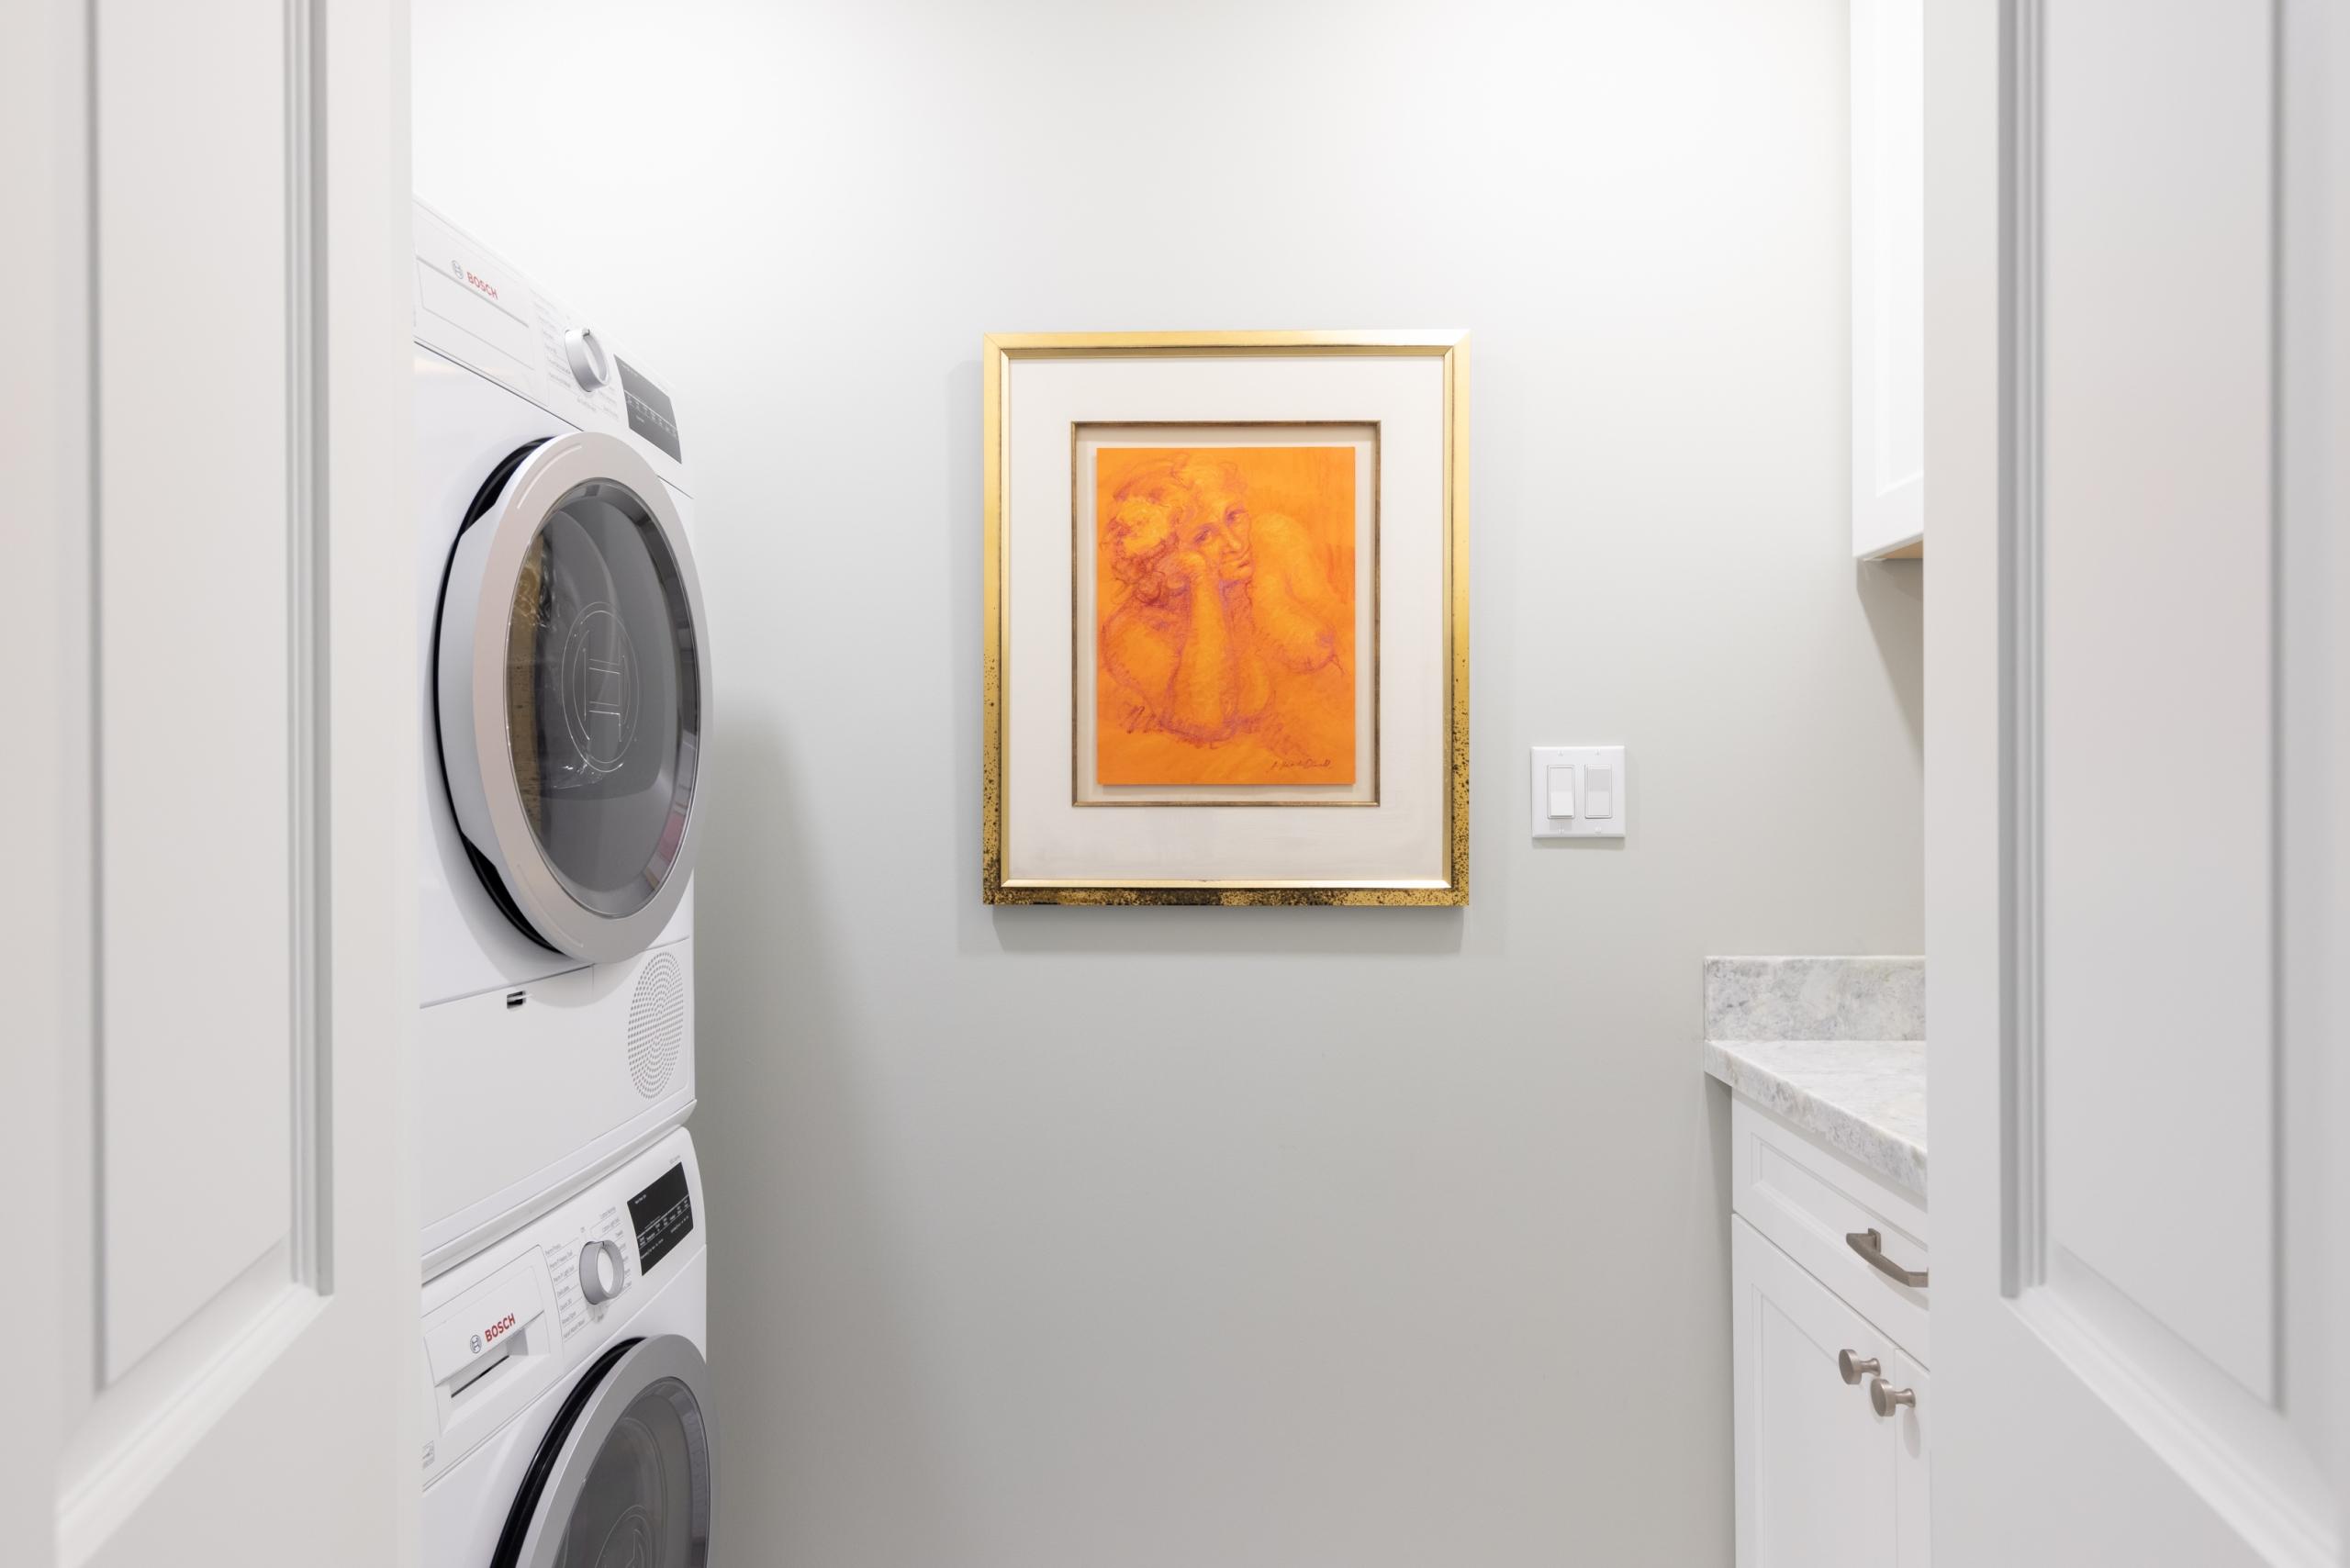 Laundry room featured at 295 William Street, Oakville. Alex Irish & Associates